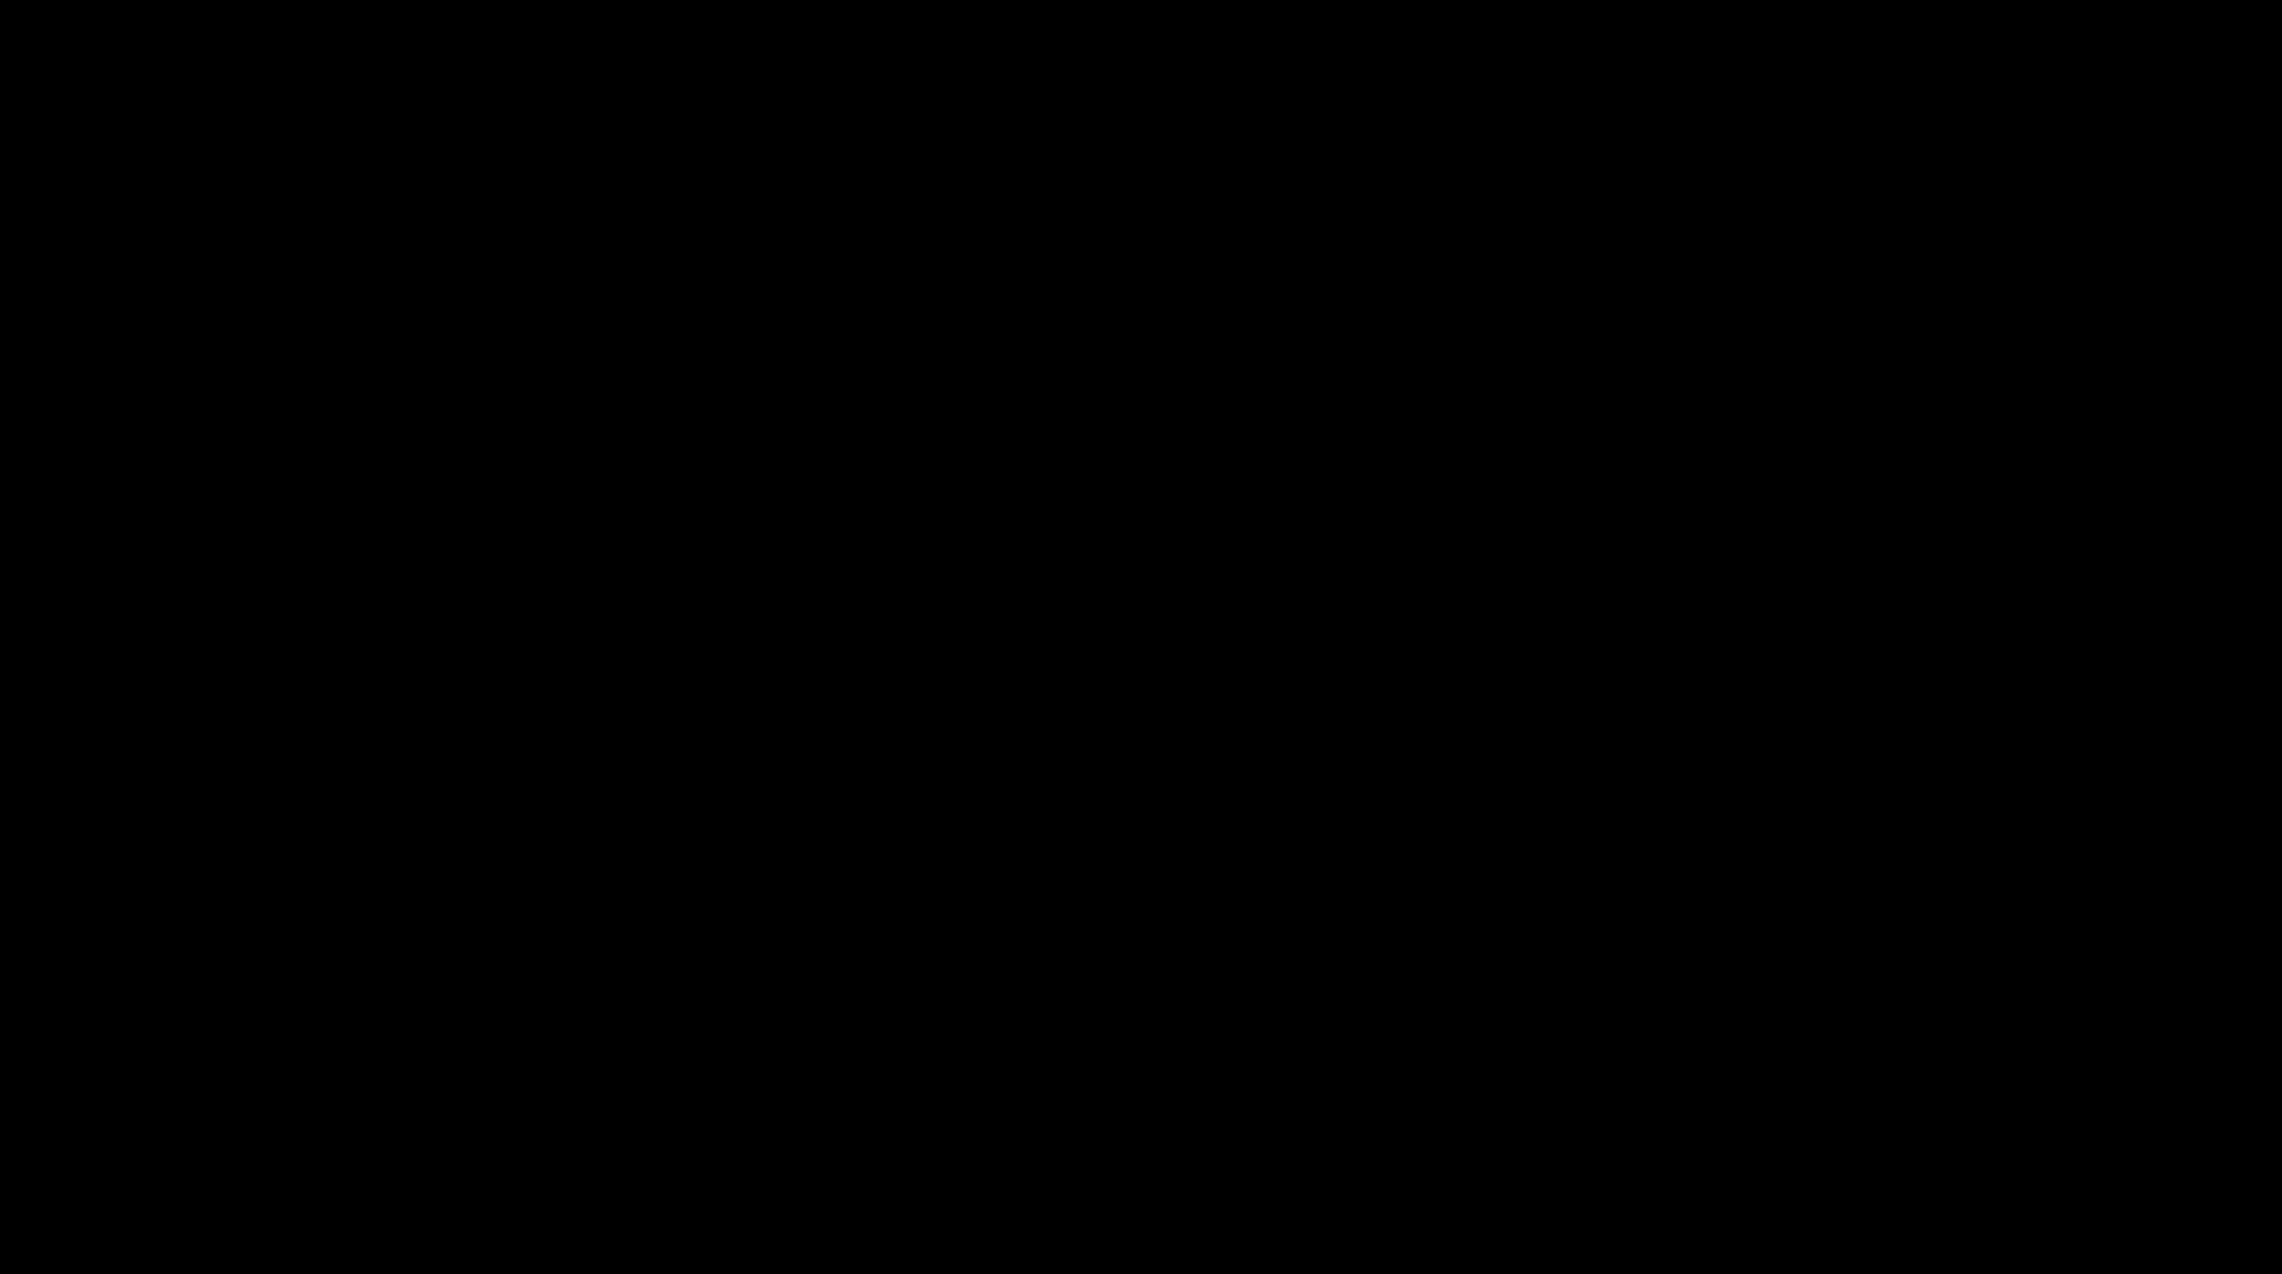 2282x1274 Rhinoceros Silhouette Icons Png